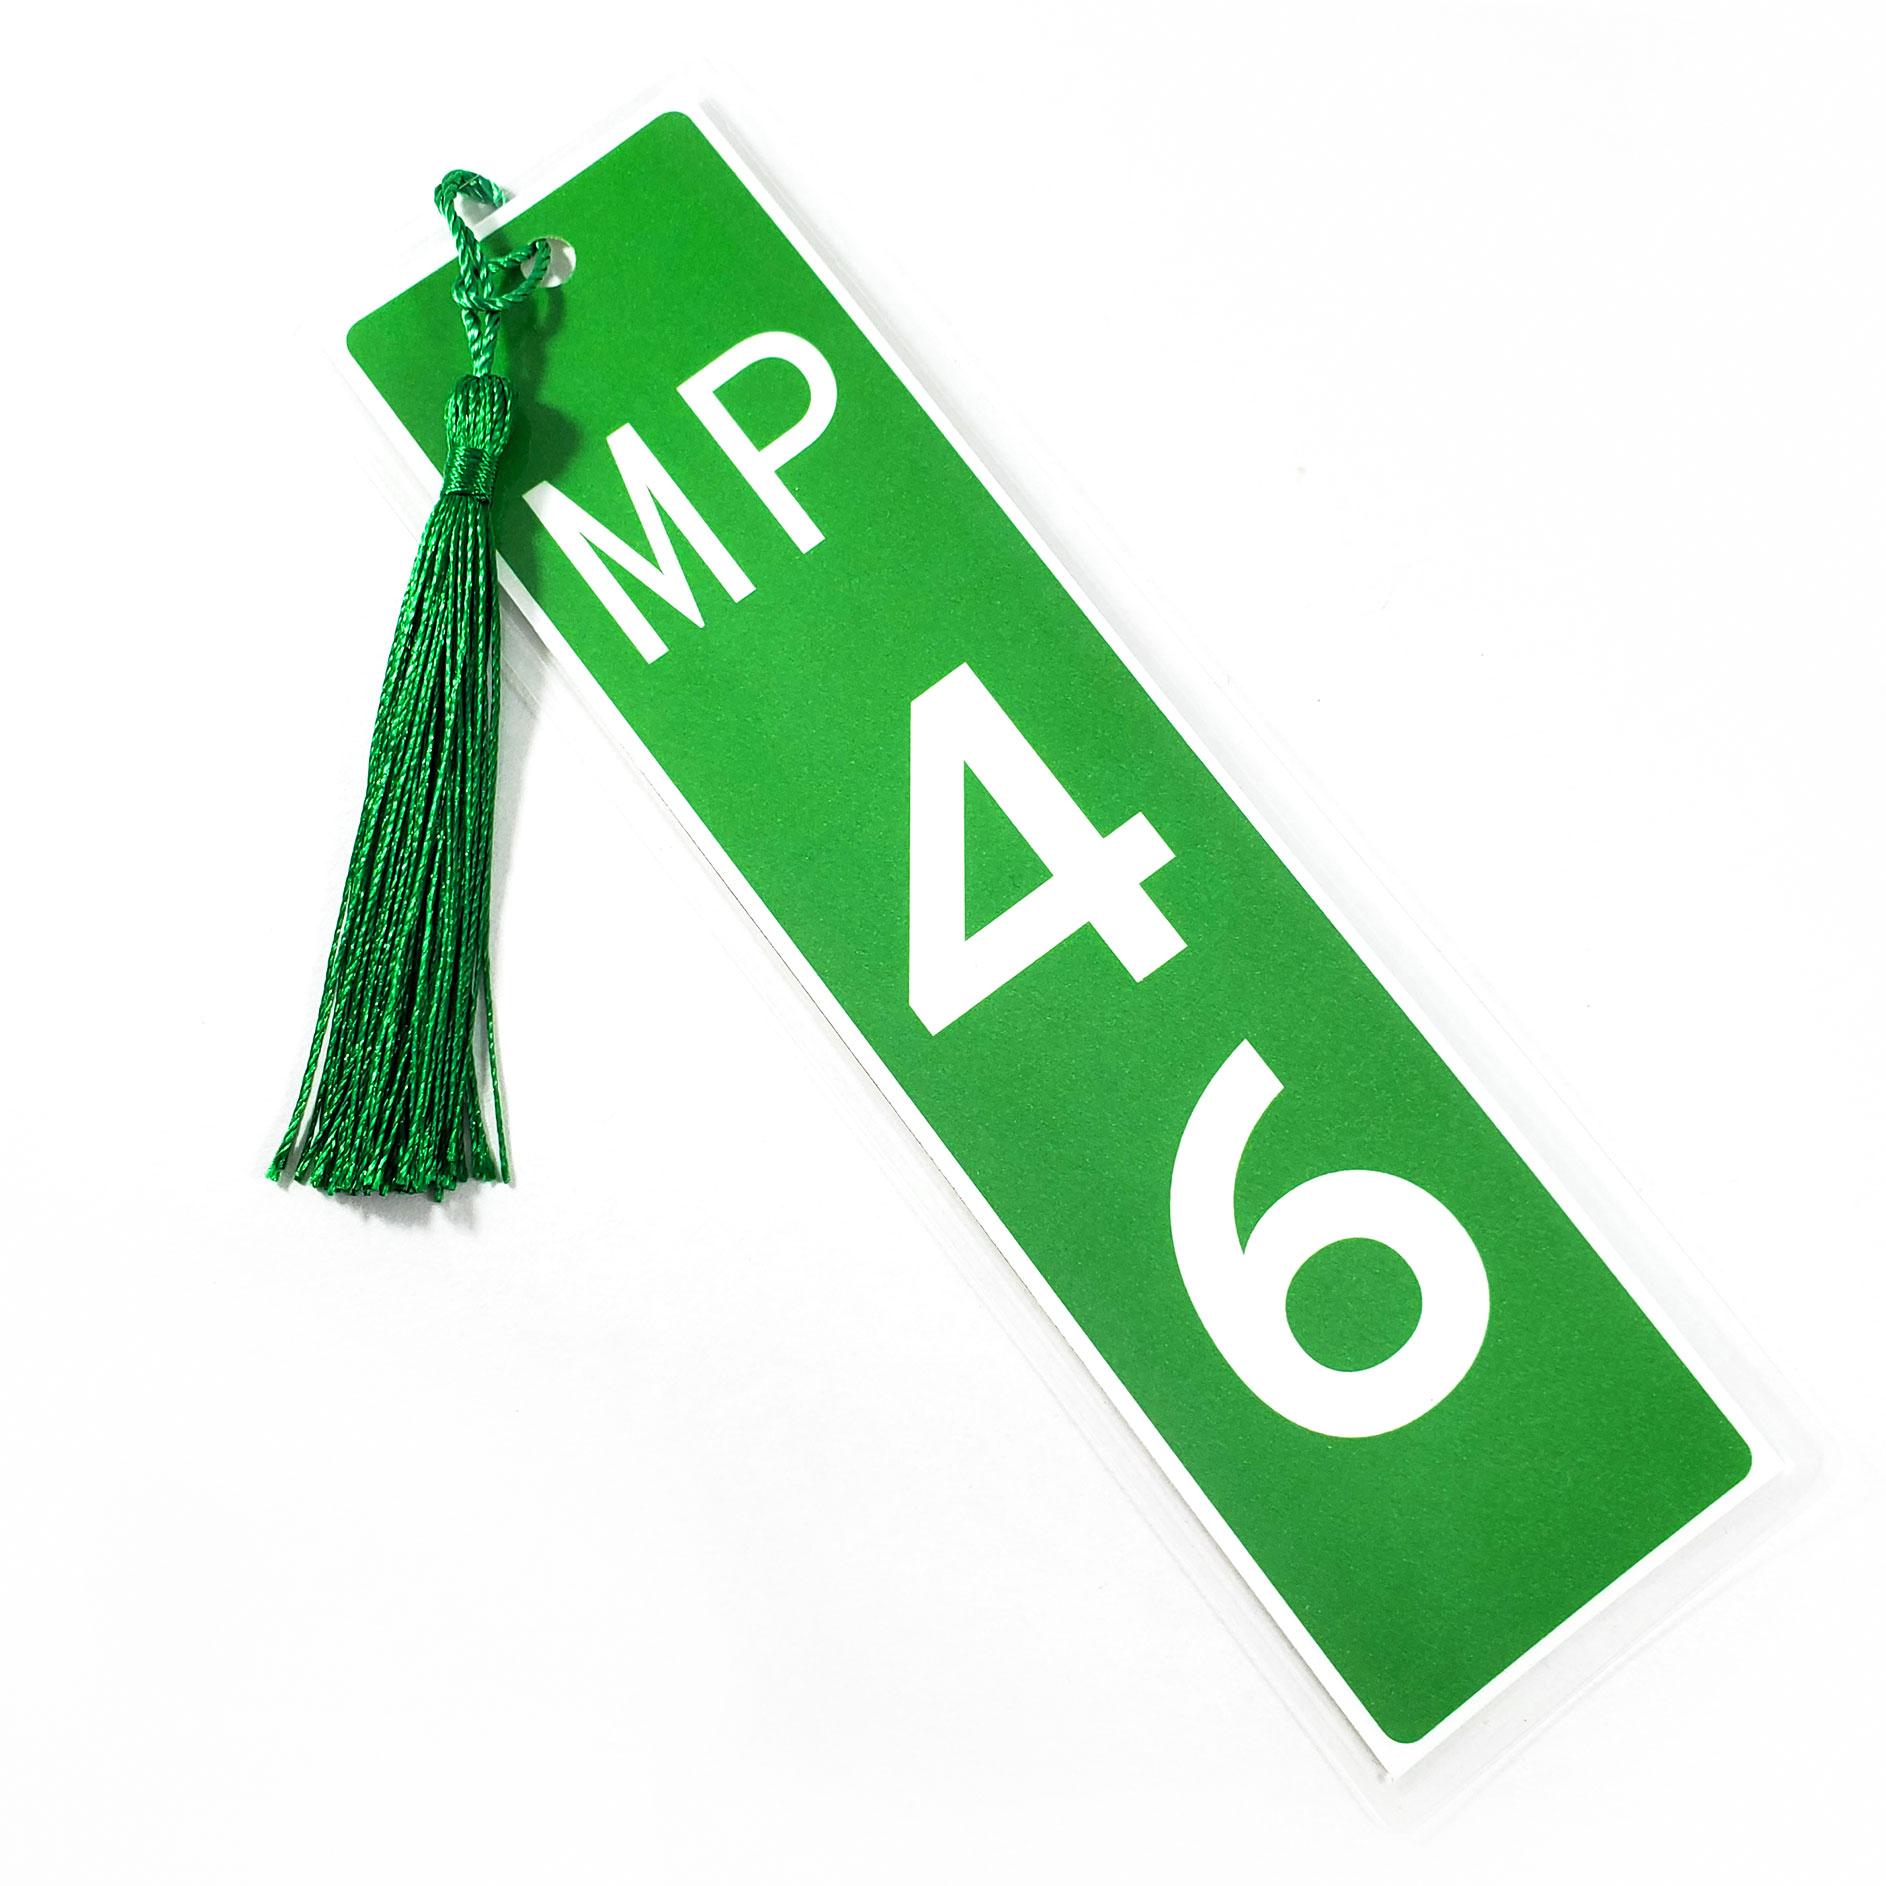 BM029MP_MP46Bookmark_ByWildeDesigns_01